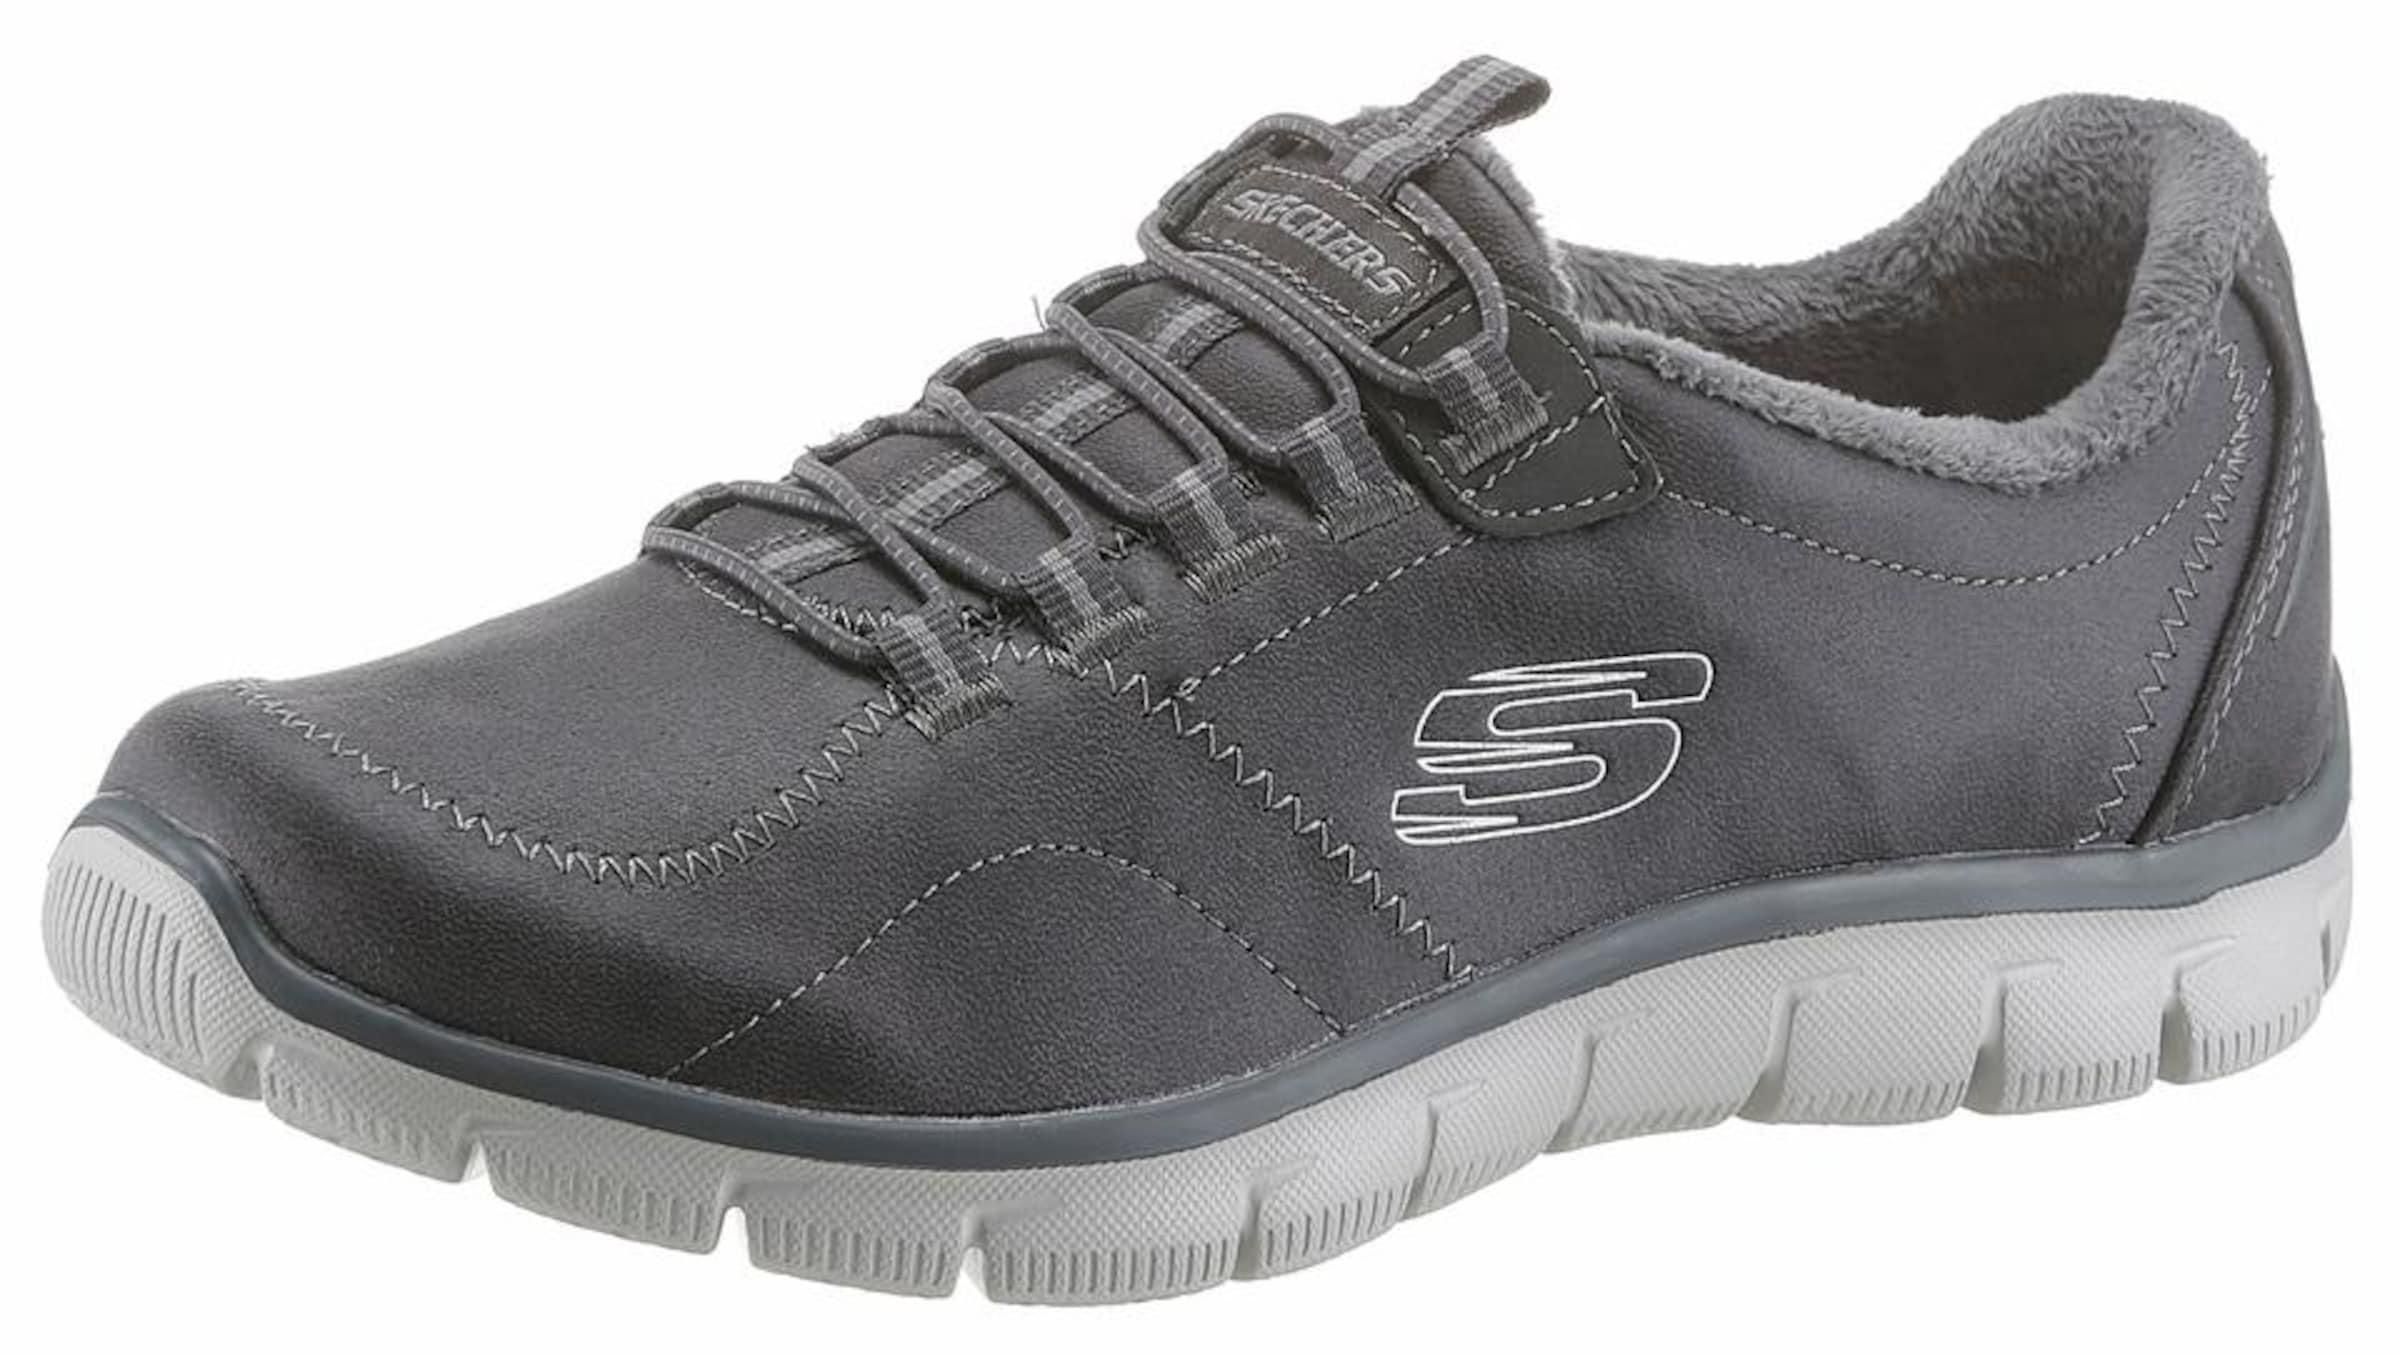 SKECHERS Empire Latest News Sneakers Hohe Qualität